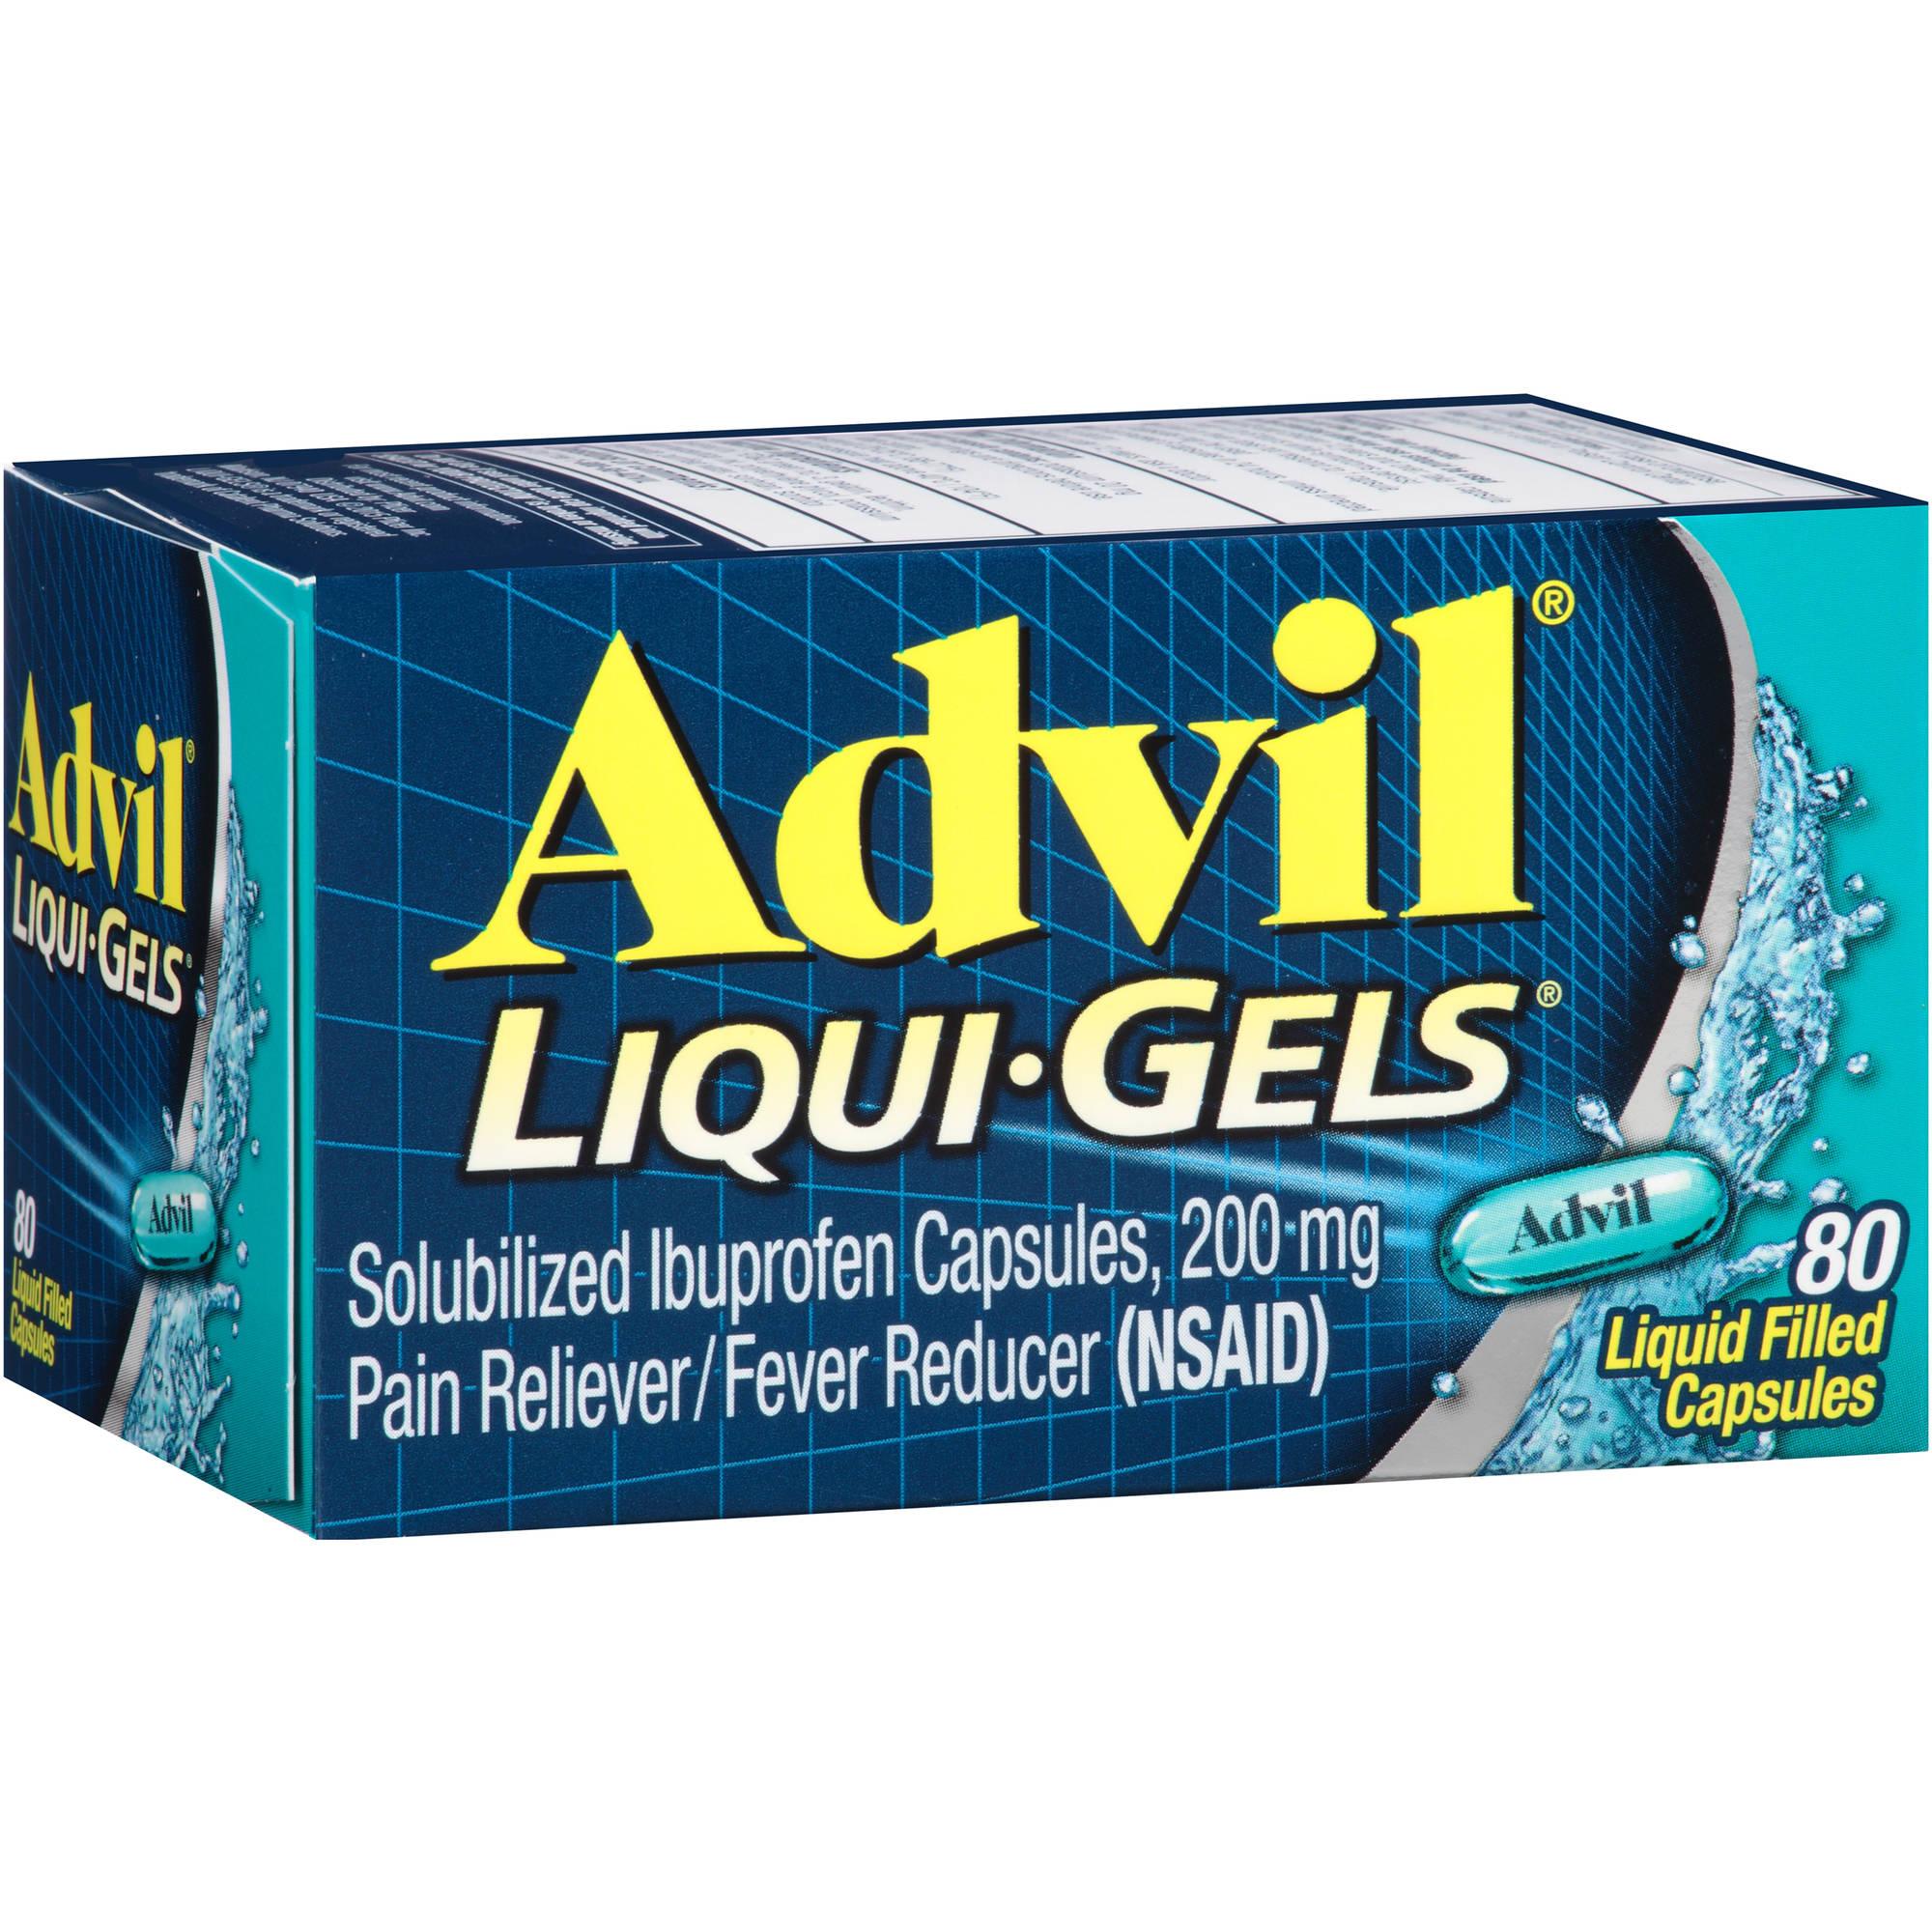 Advil Liqui-Gels Pain Reliever / Fever Reducer (Ibuprofen), 200 mg 80 count